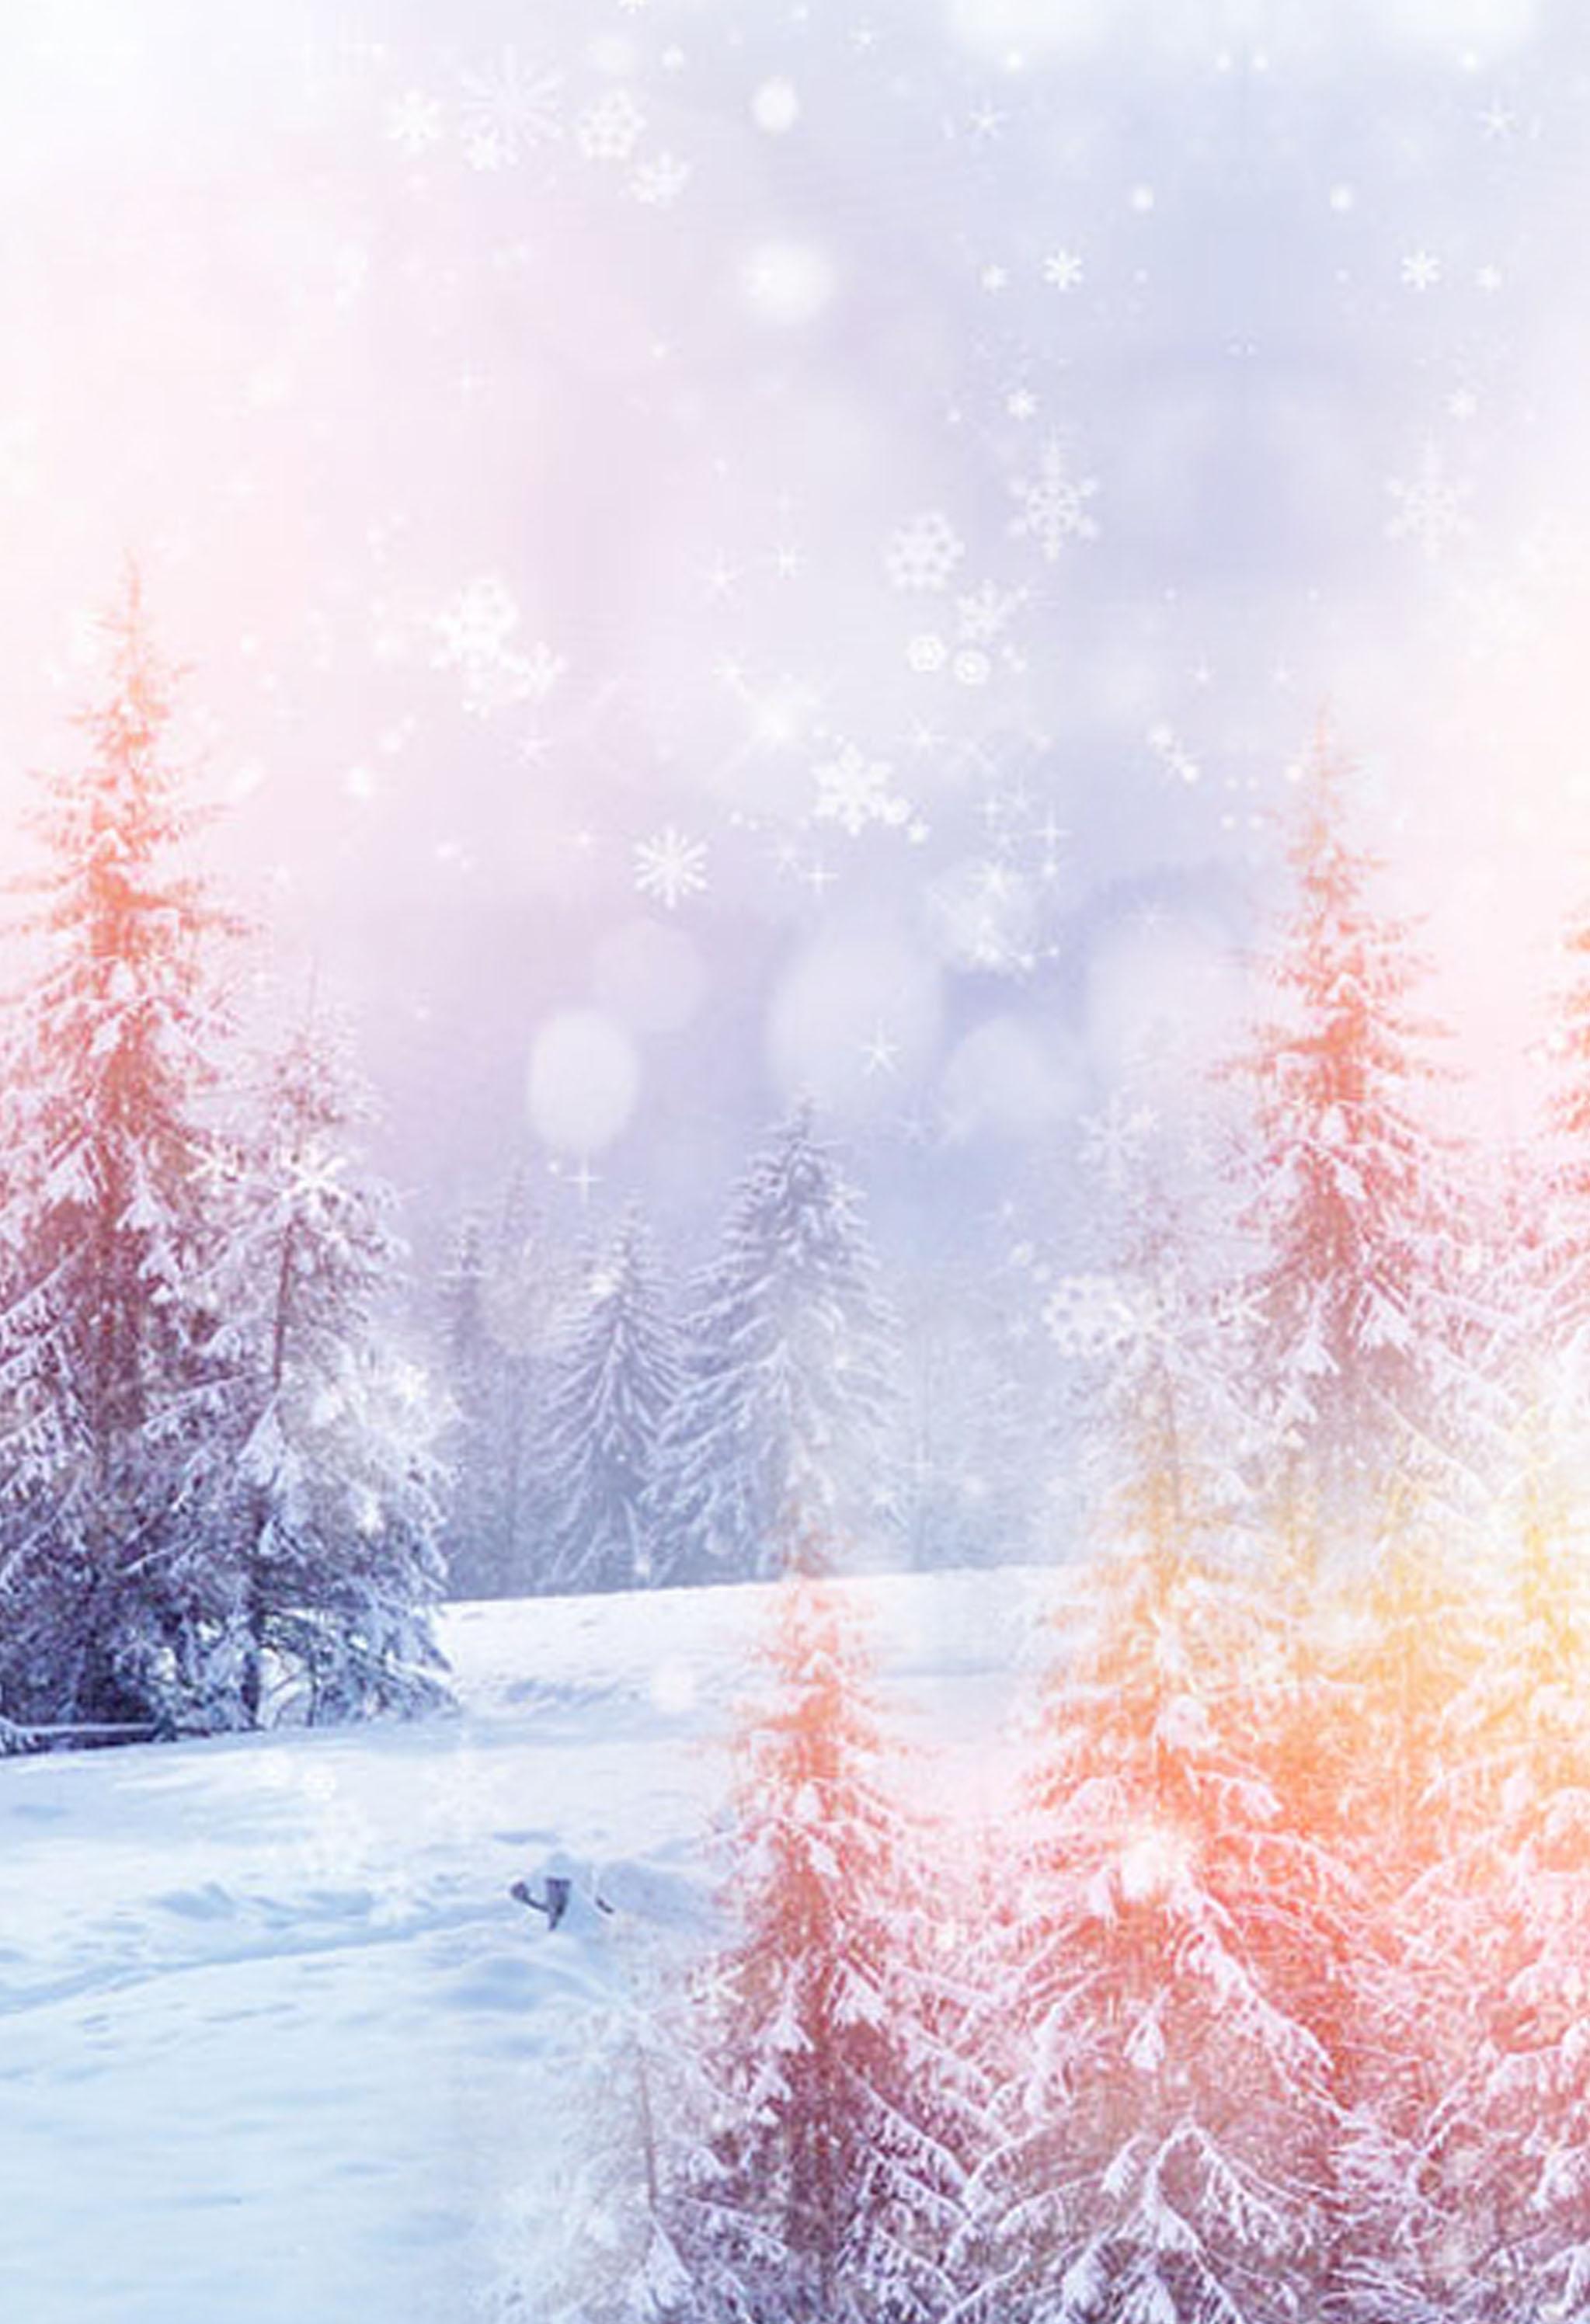 romantic fantasy snowy background  romantic  snow  winter